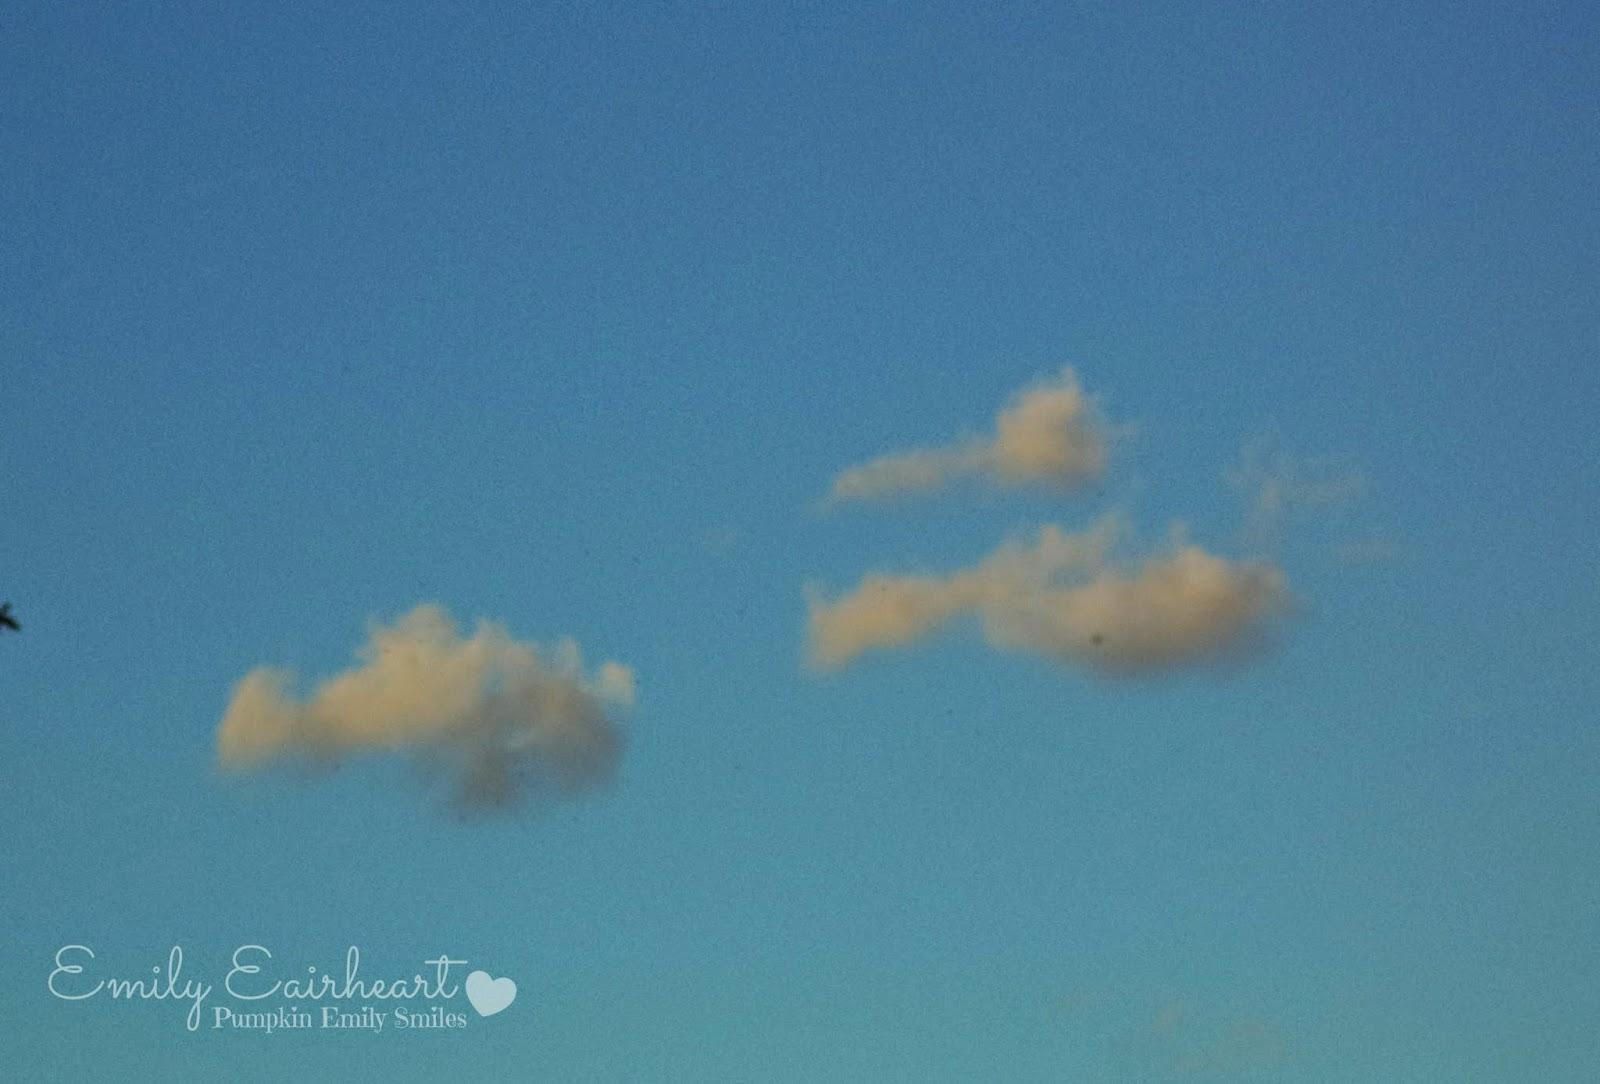 Clouds that look like ducks.